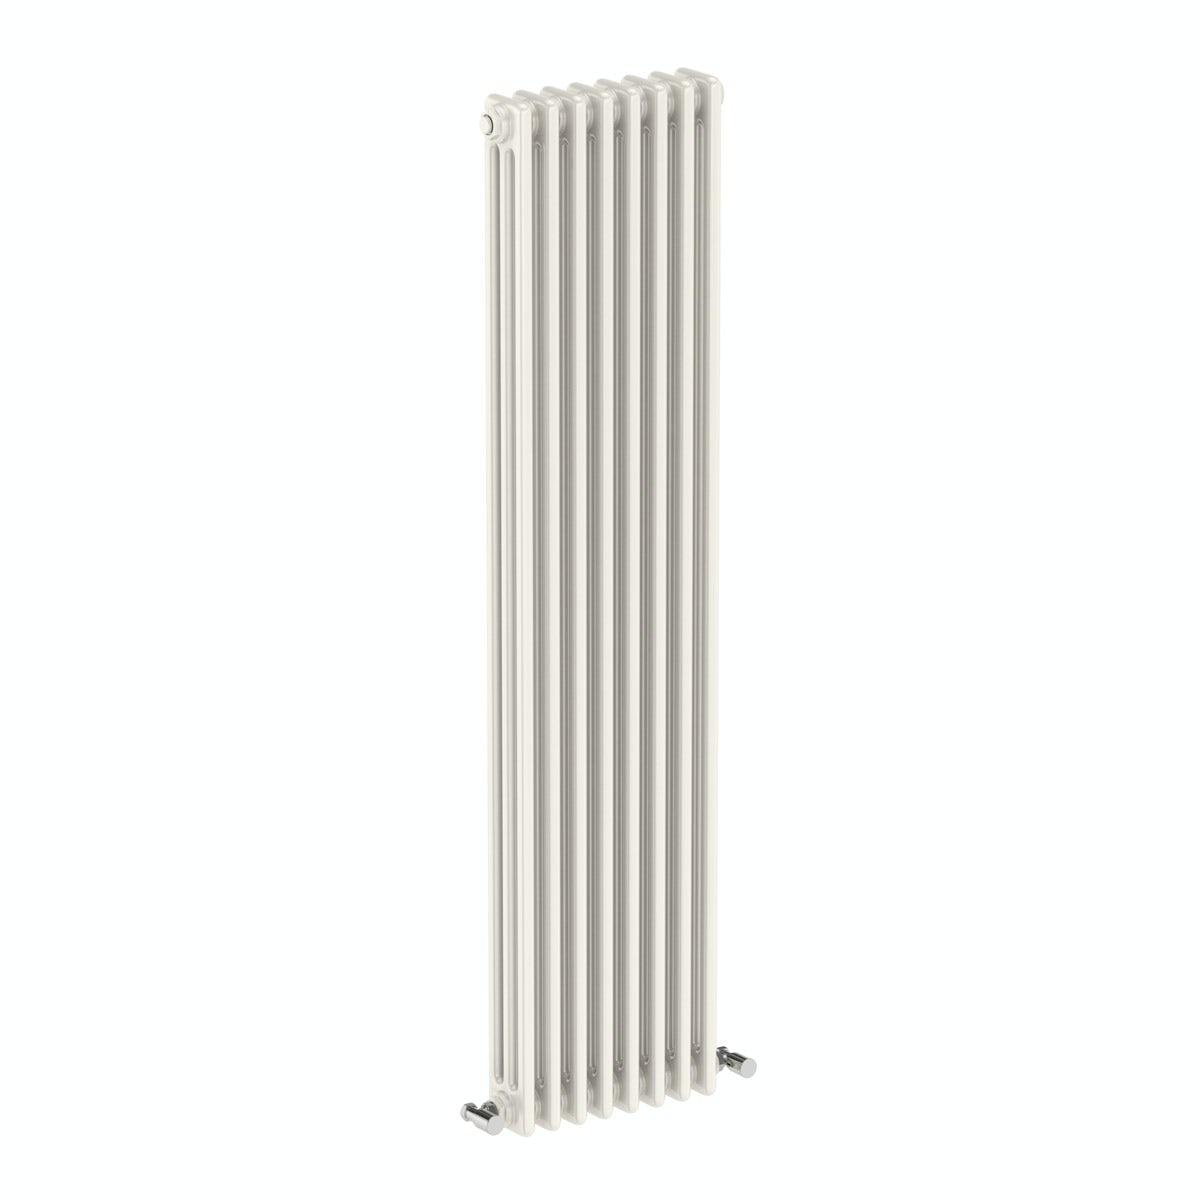 The Bath Co. Dulwich vertical white triple column radiator 1500 x 380 offer pack